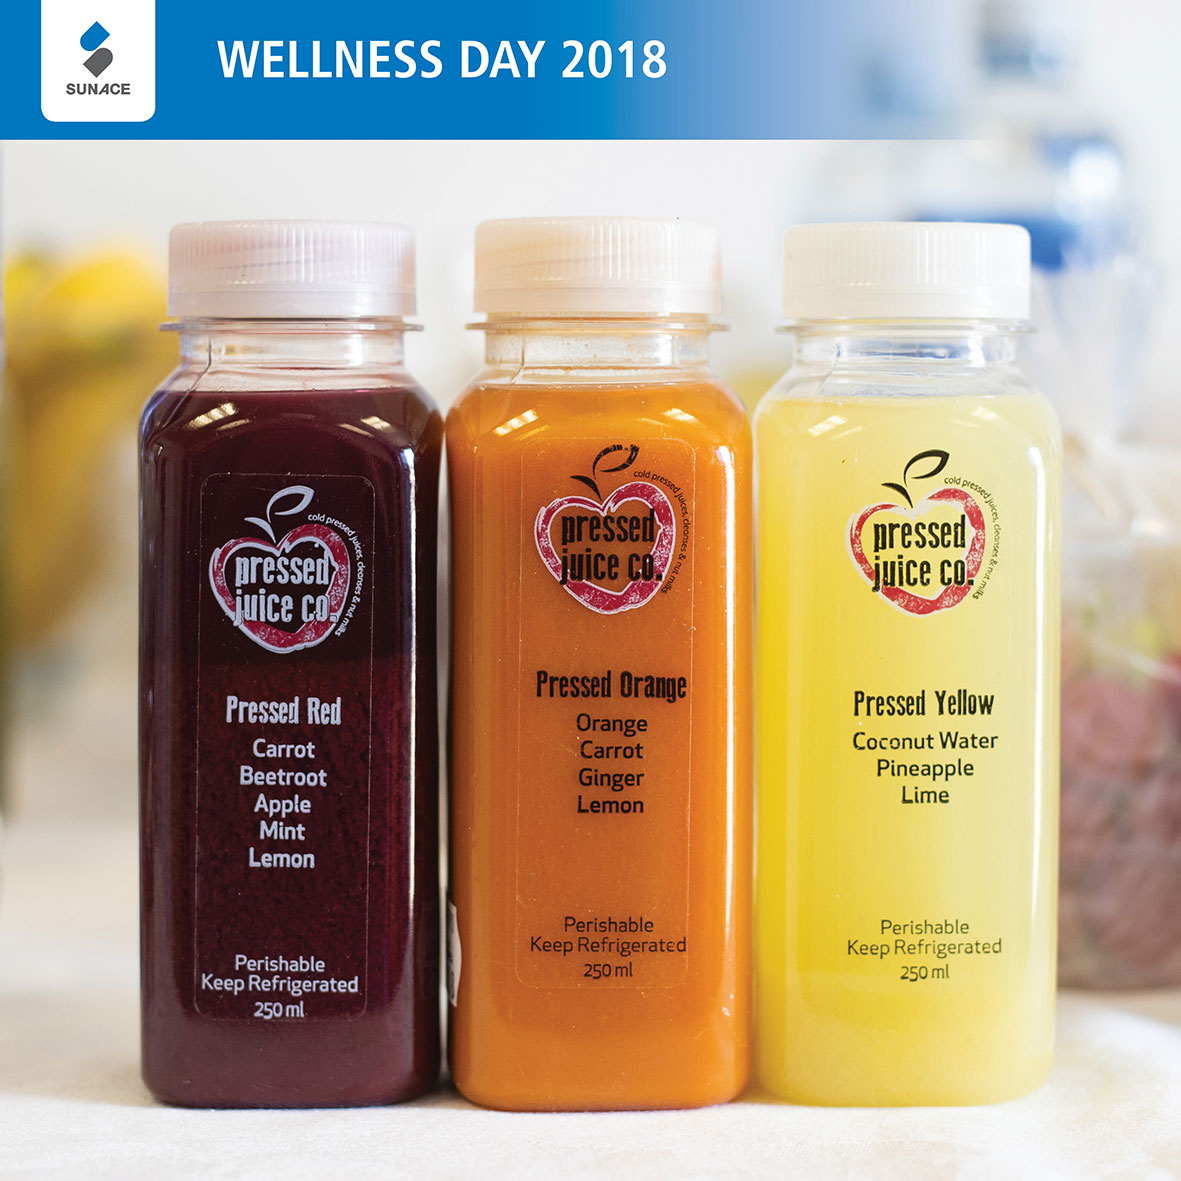 Wellness Day Pressed Juice Treats